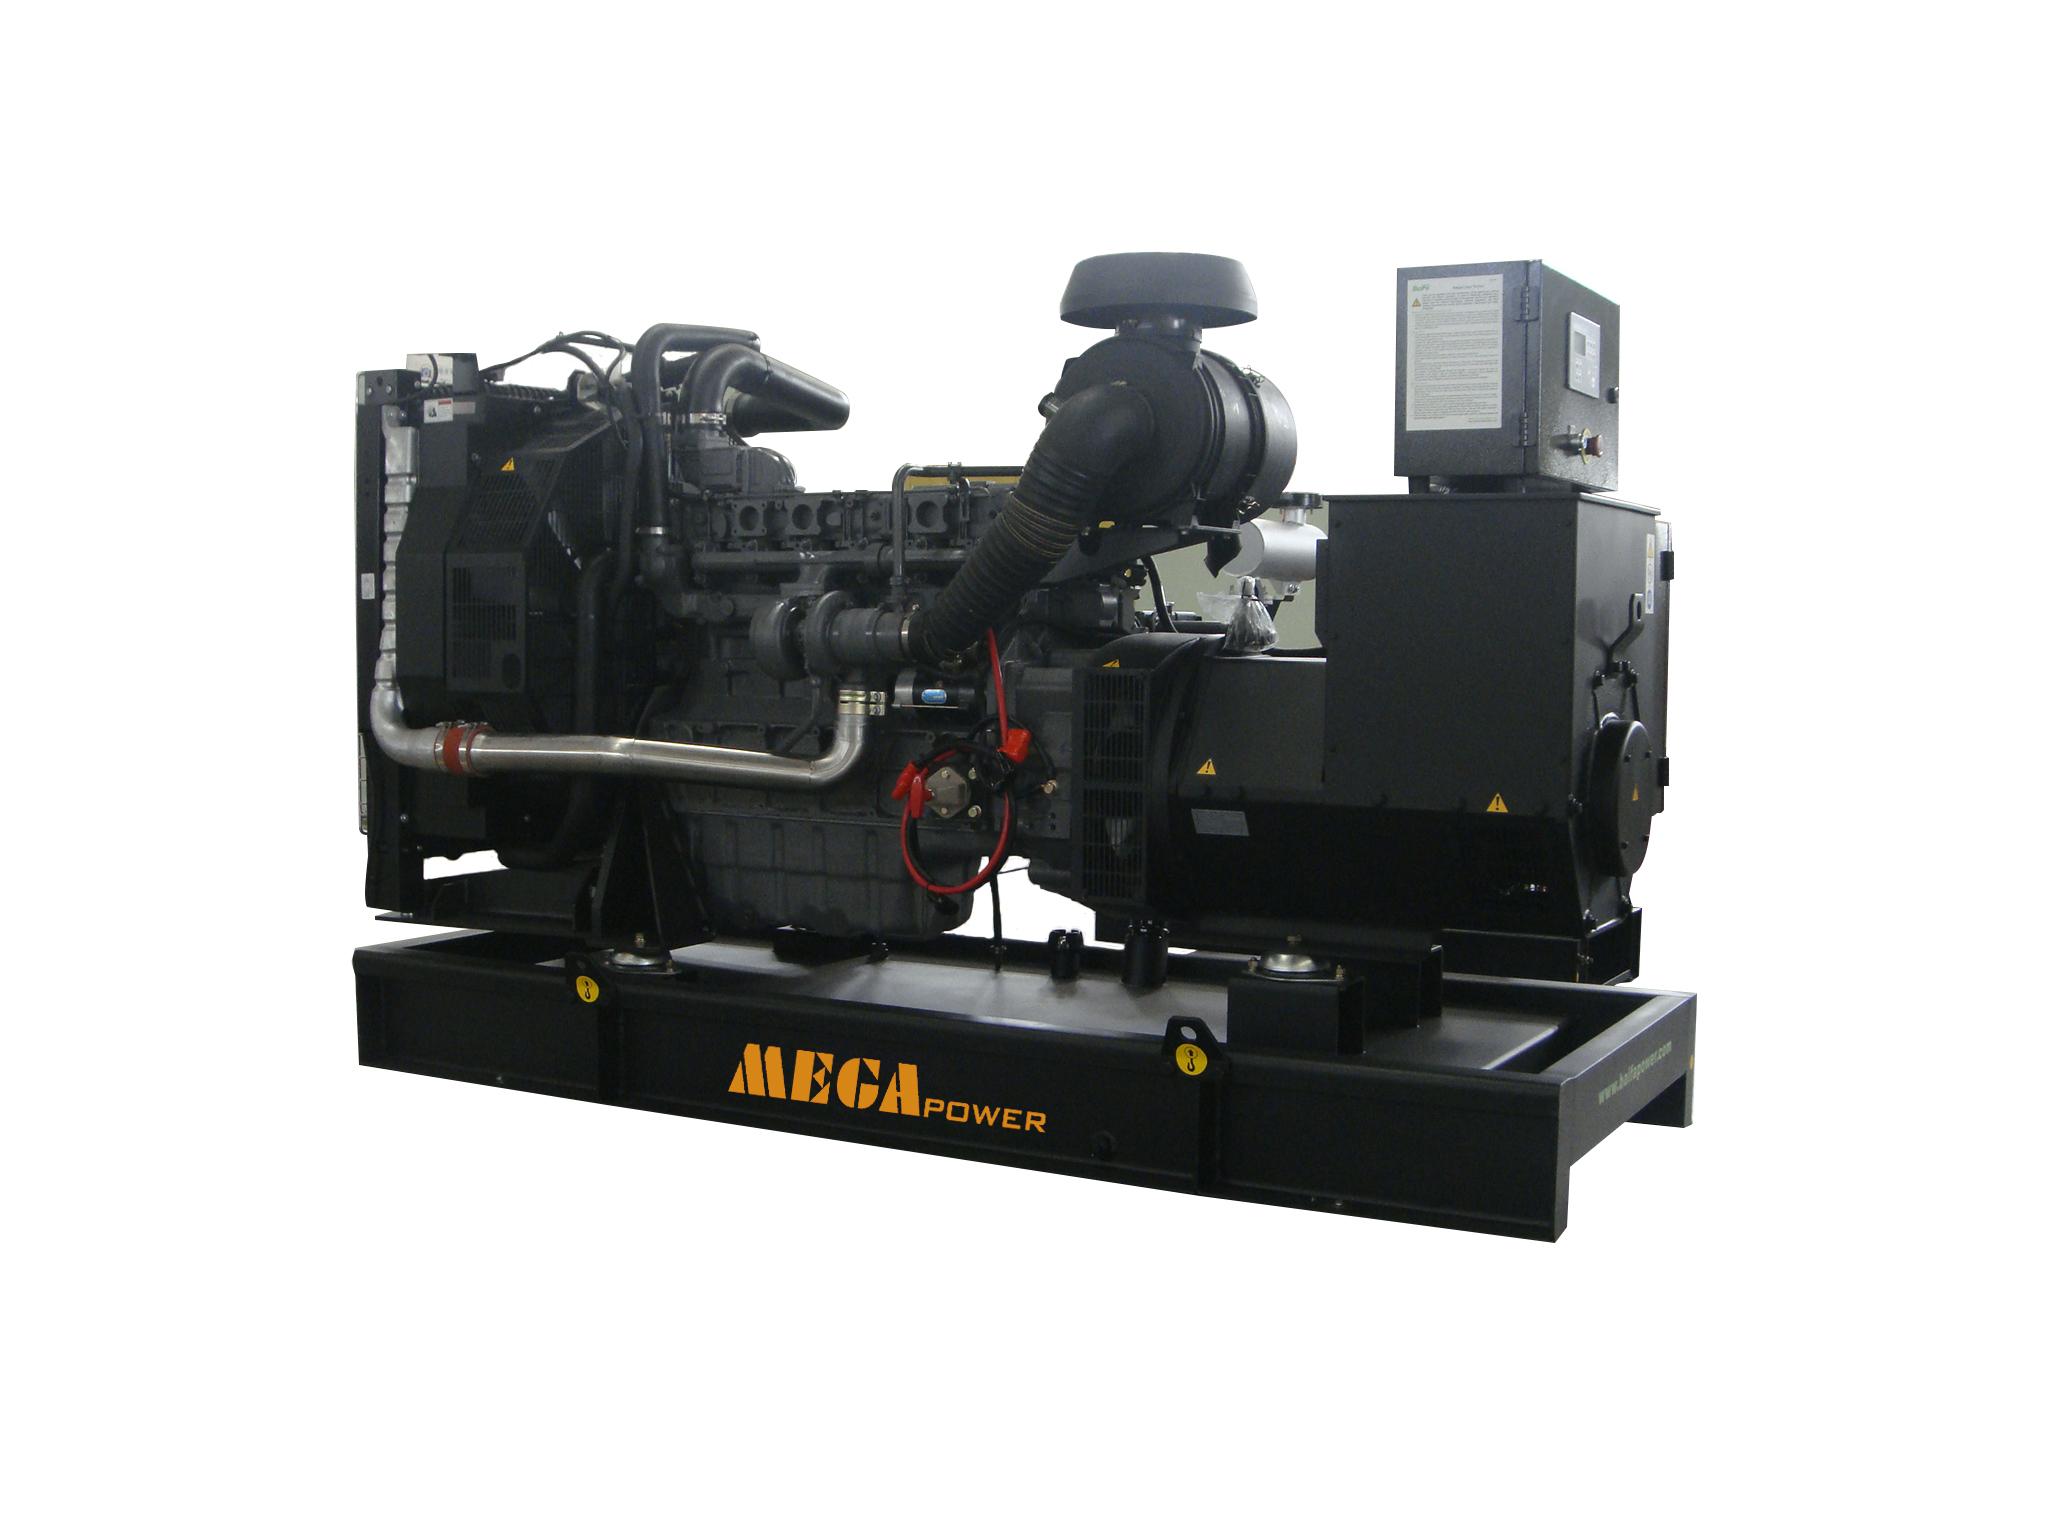 Products 50 HZ international Mega Power Solution Co Ltd